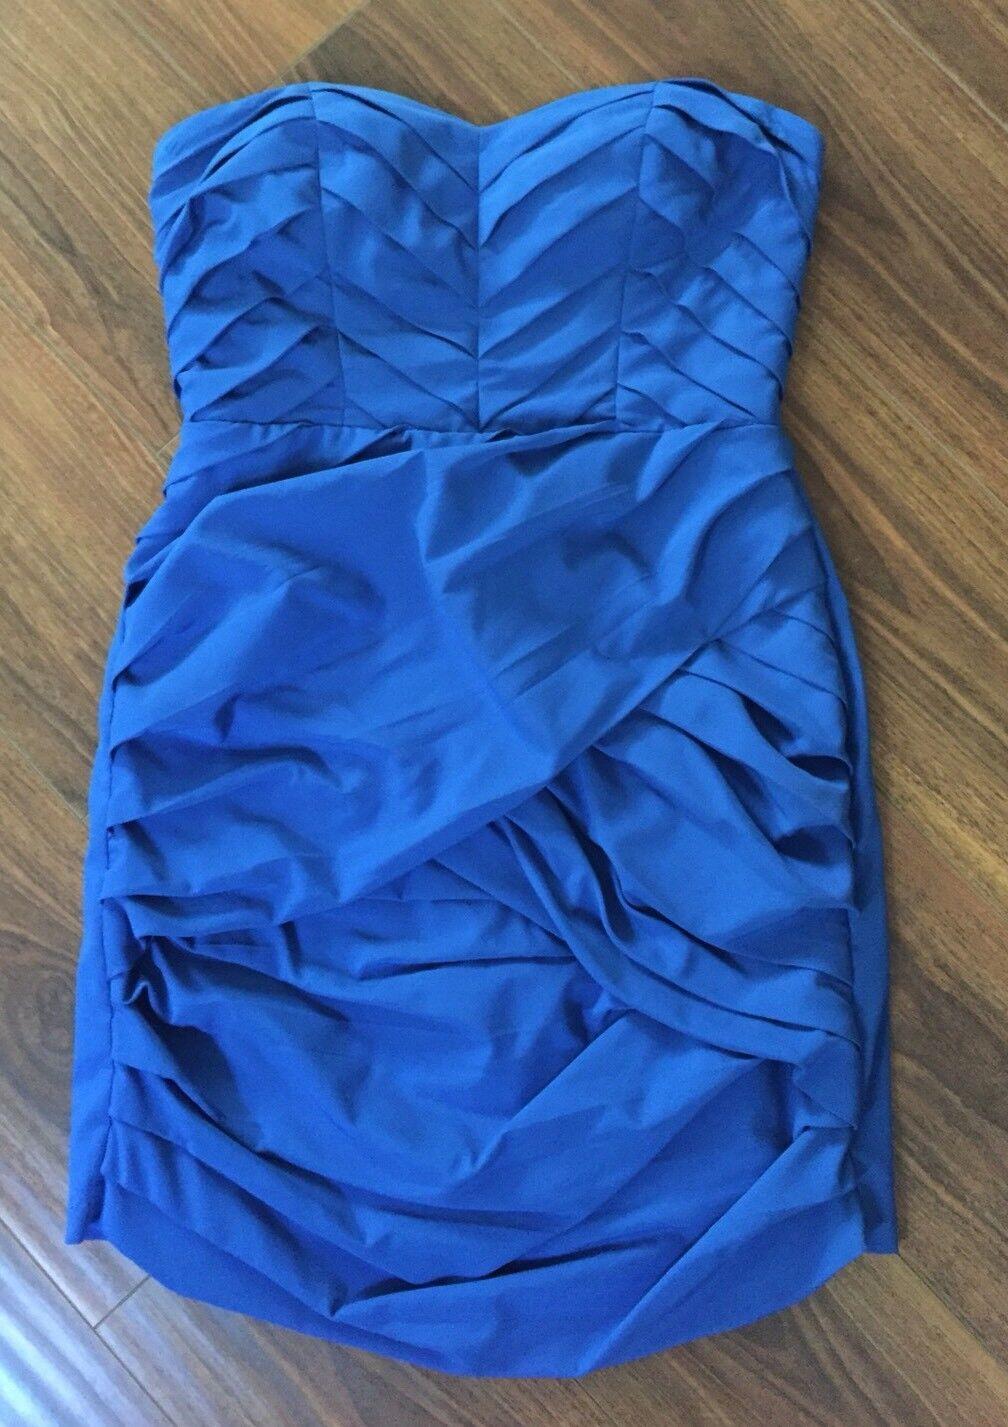 Bloomingdales Aqua Solid Blau Sweetheart Strapless Sexy Cocktail Dress Sz S